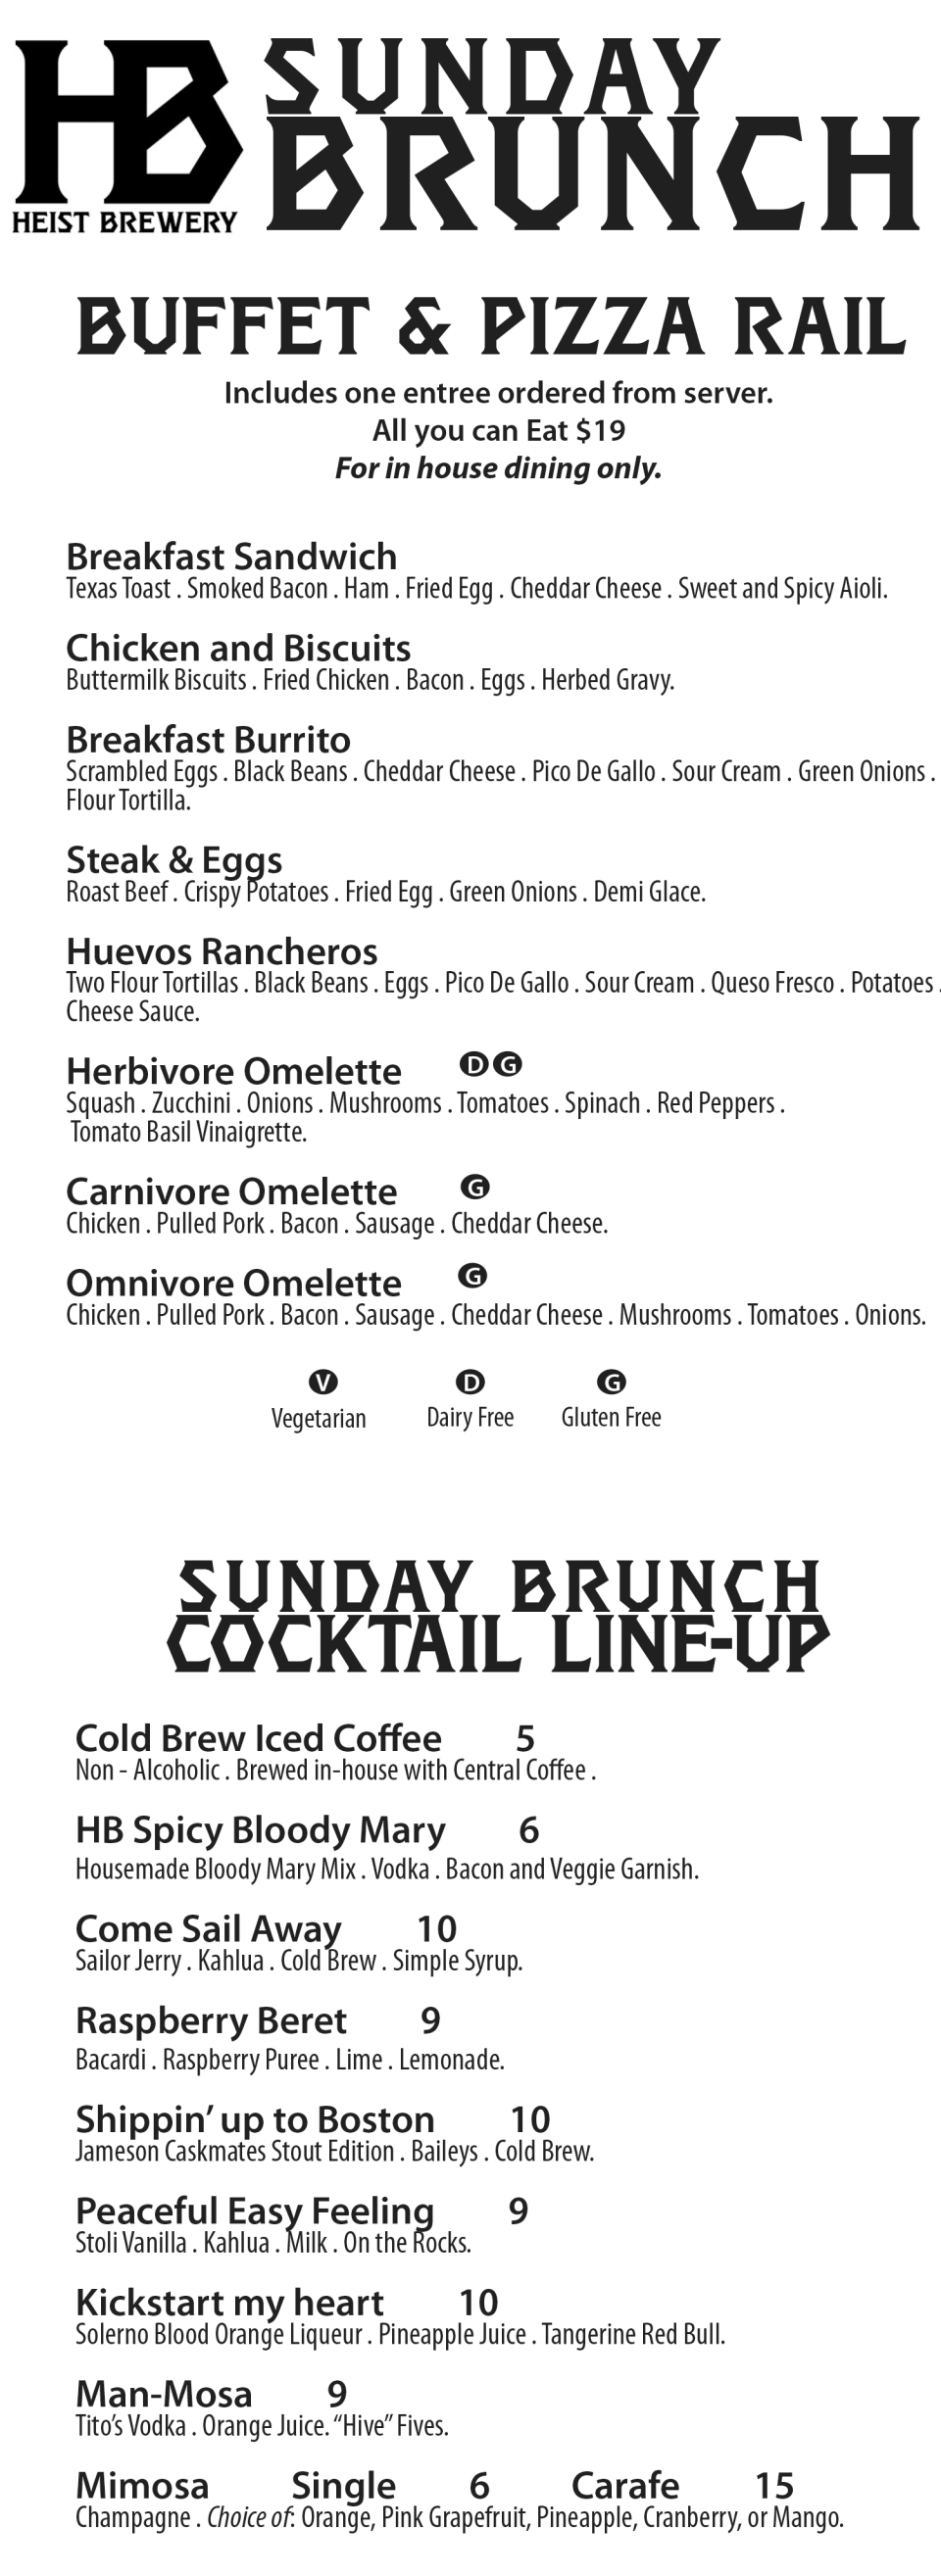 Sunday Brunch menu 2-22-18